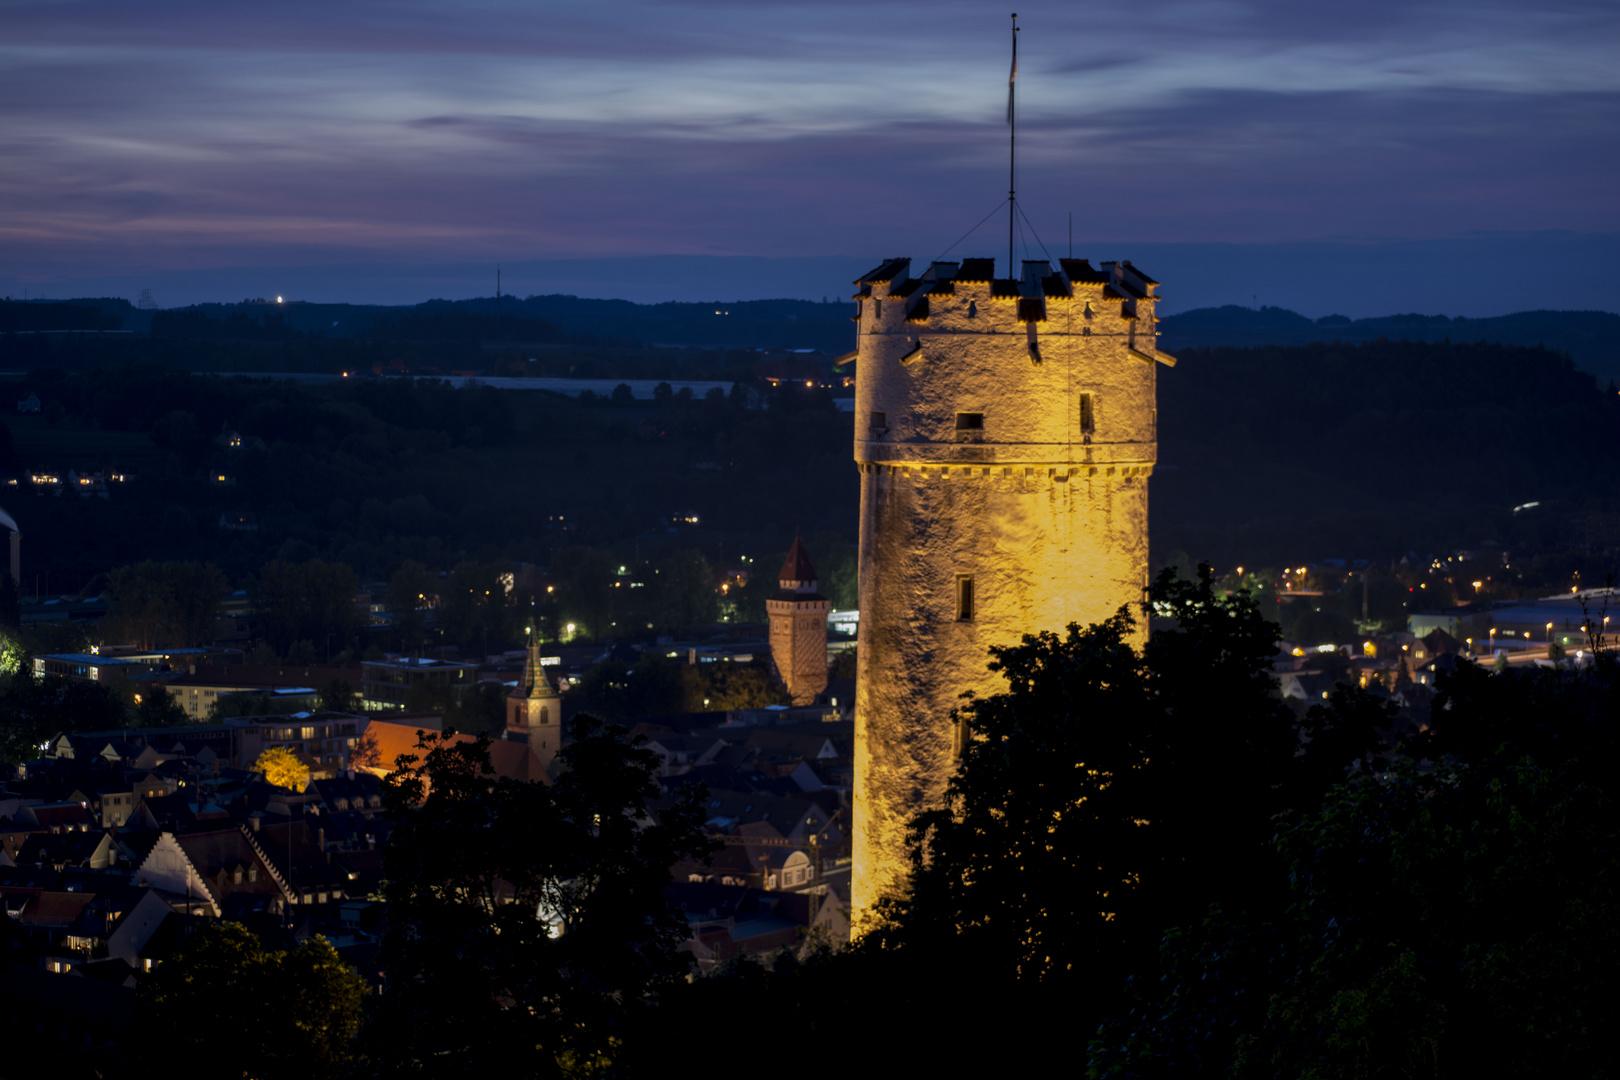 Ravensburg!